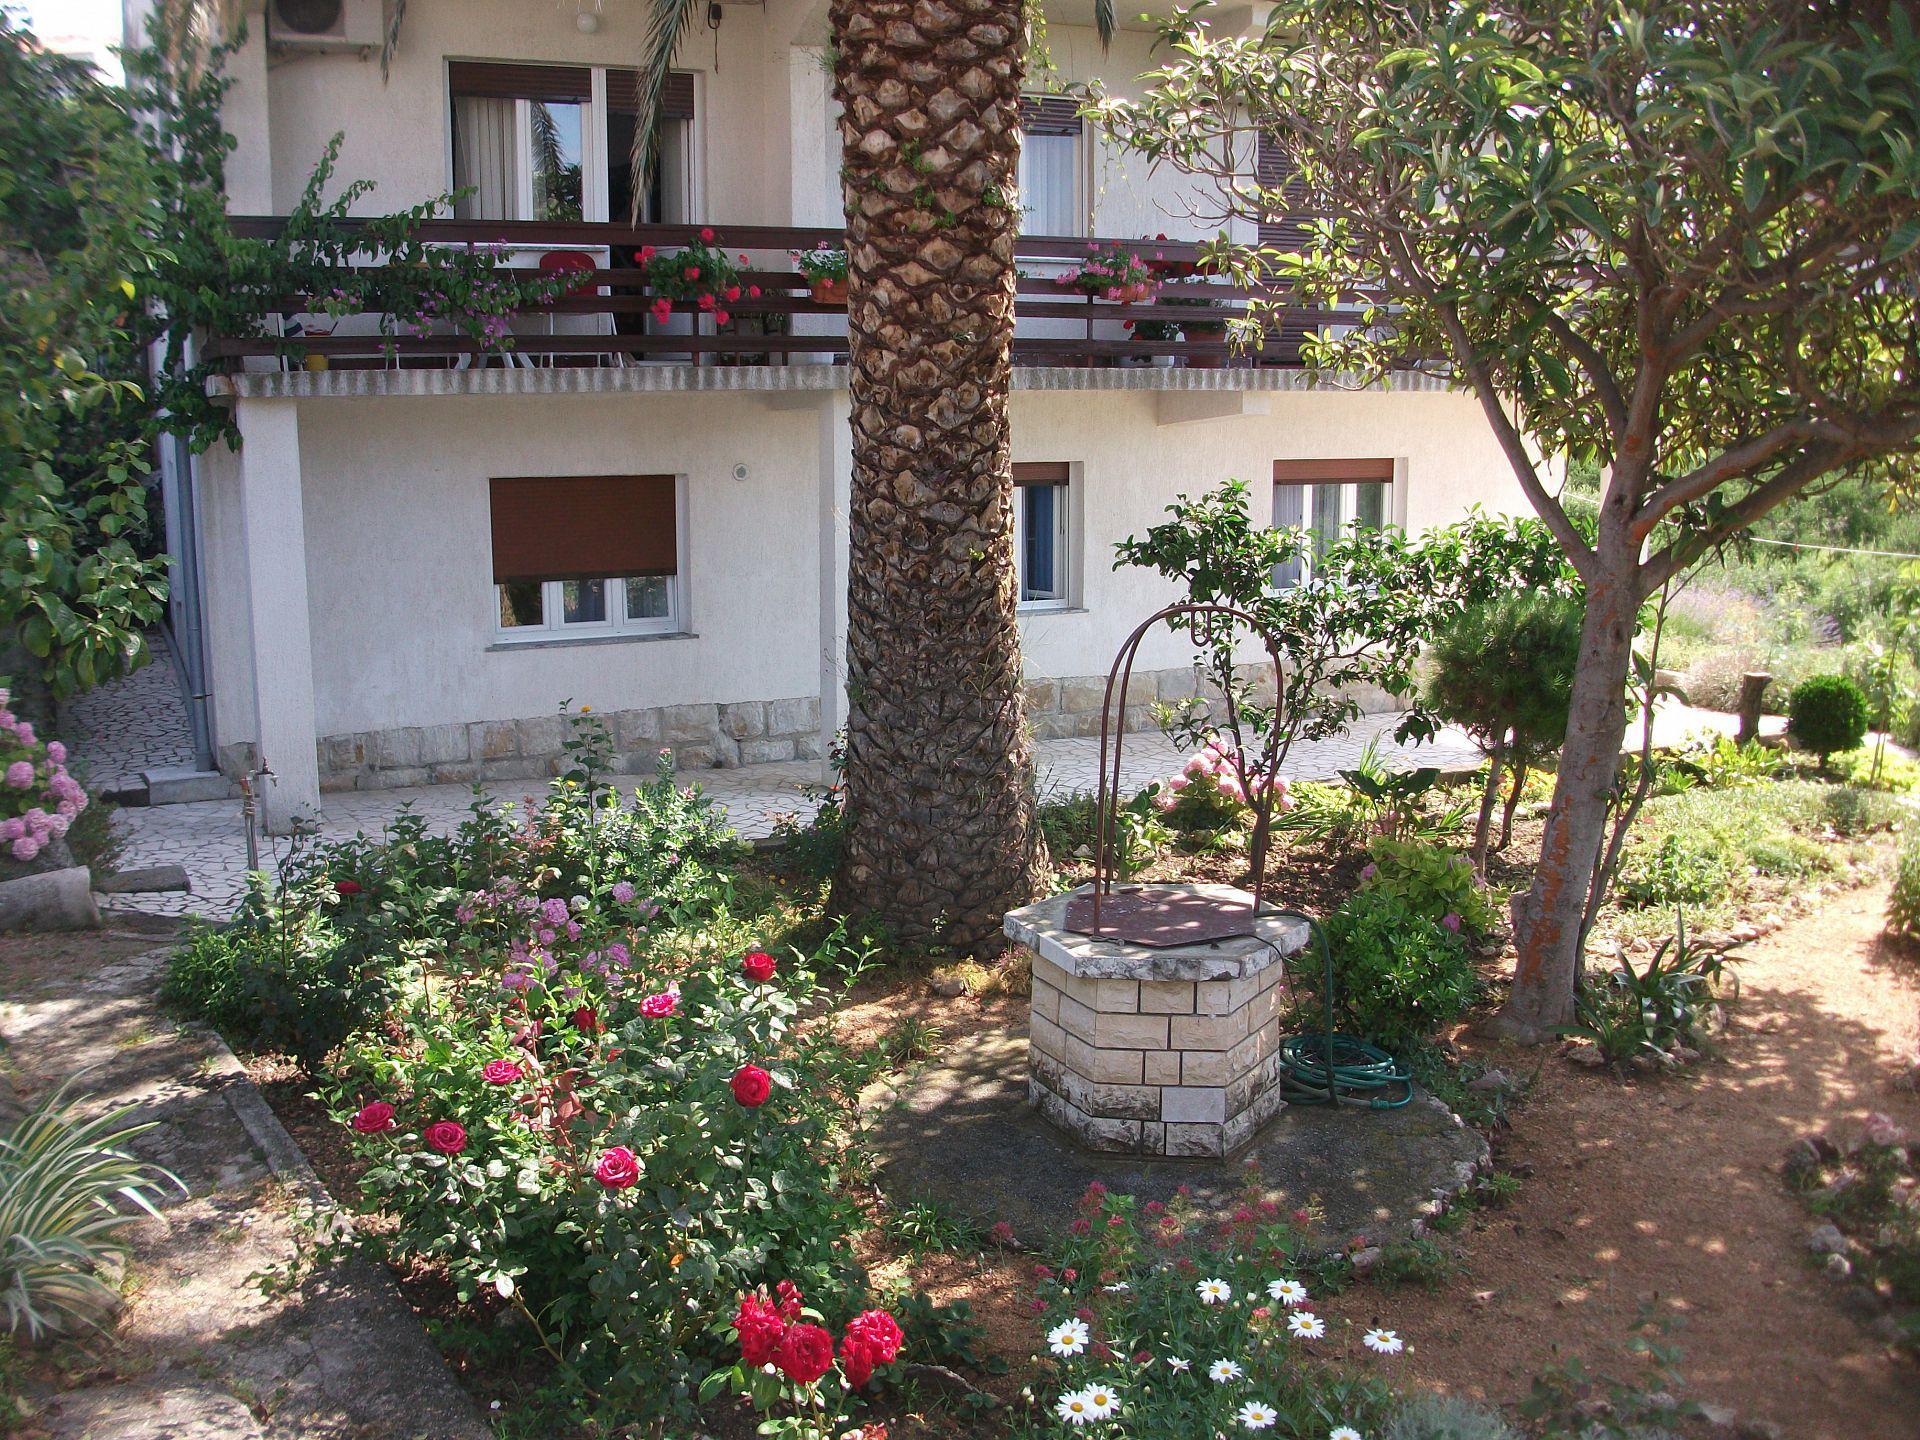 Apartmány, Banjole, Pula a juh Istrie - Apartmány  Miljenko - 150 m from beach: